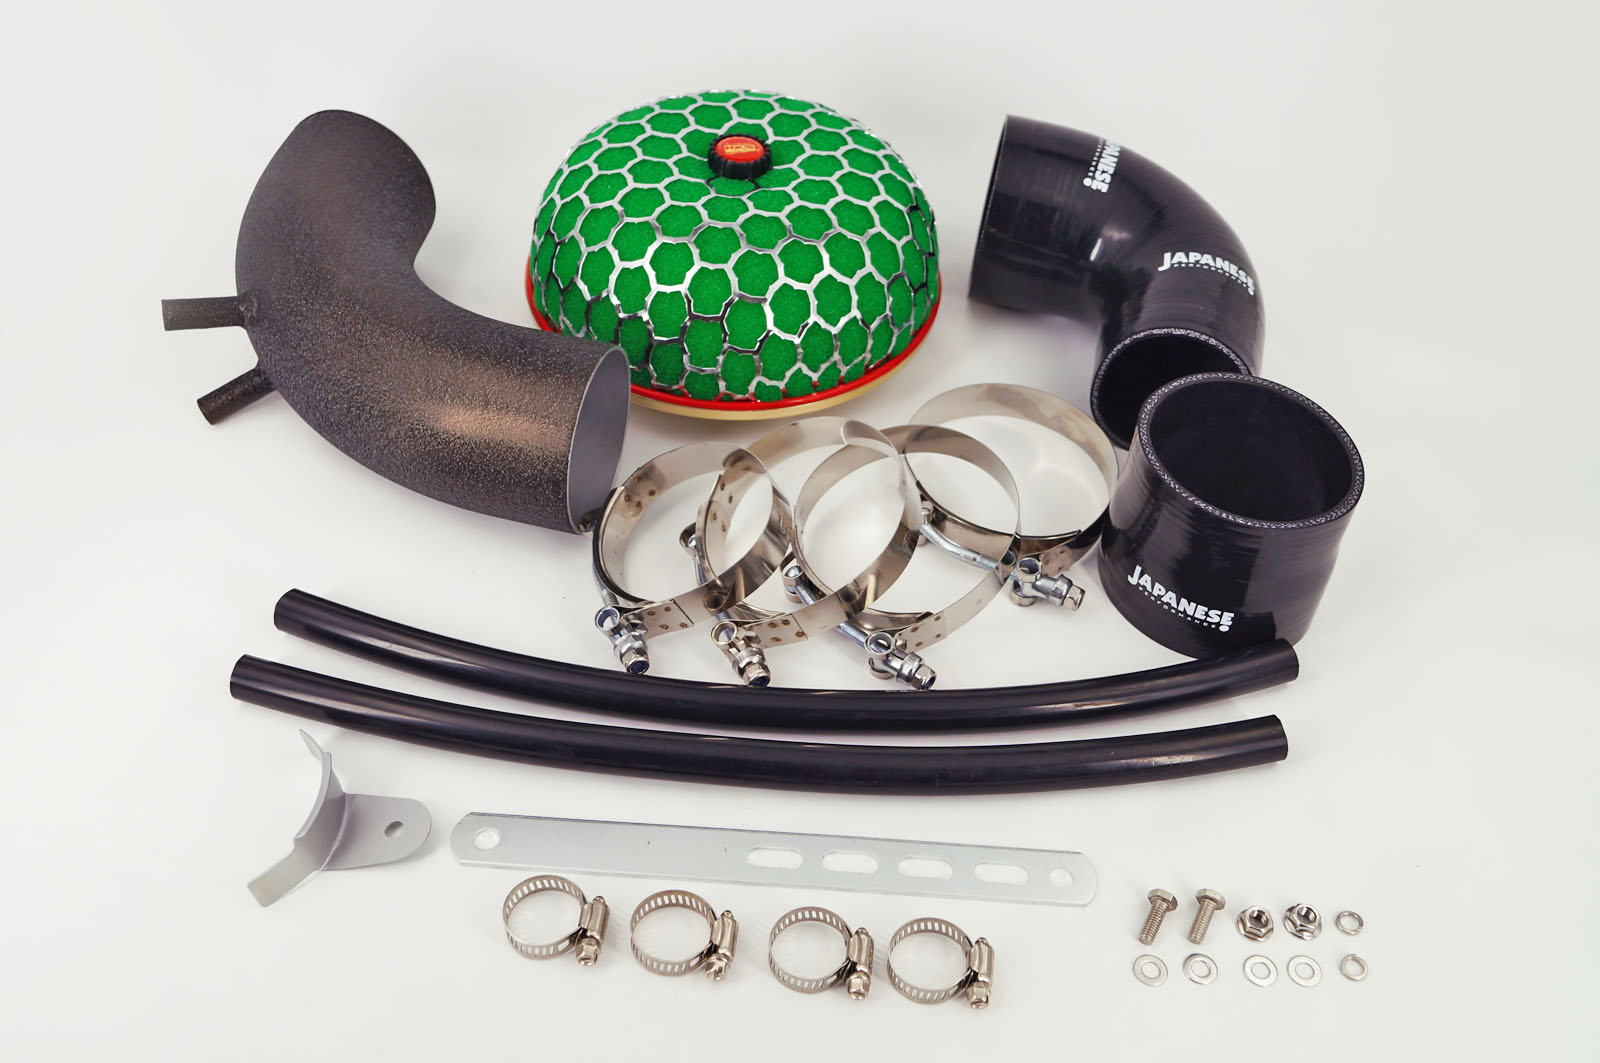 Turbocharged Air Intake Kit For HYUNDAI GENESIS COUPE 2.0L 2010 / 2011 / 2012